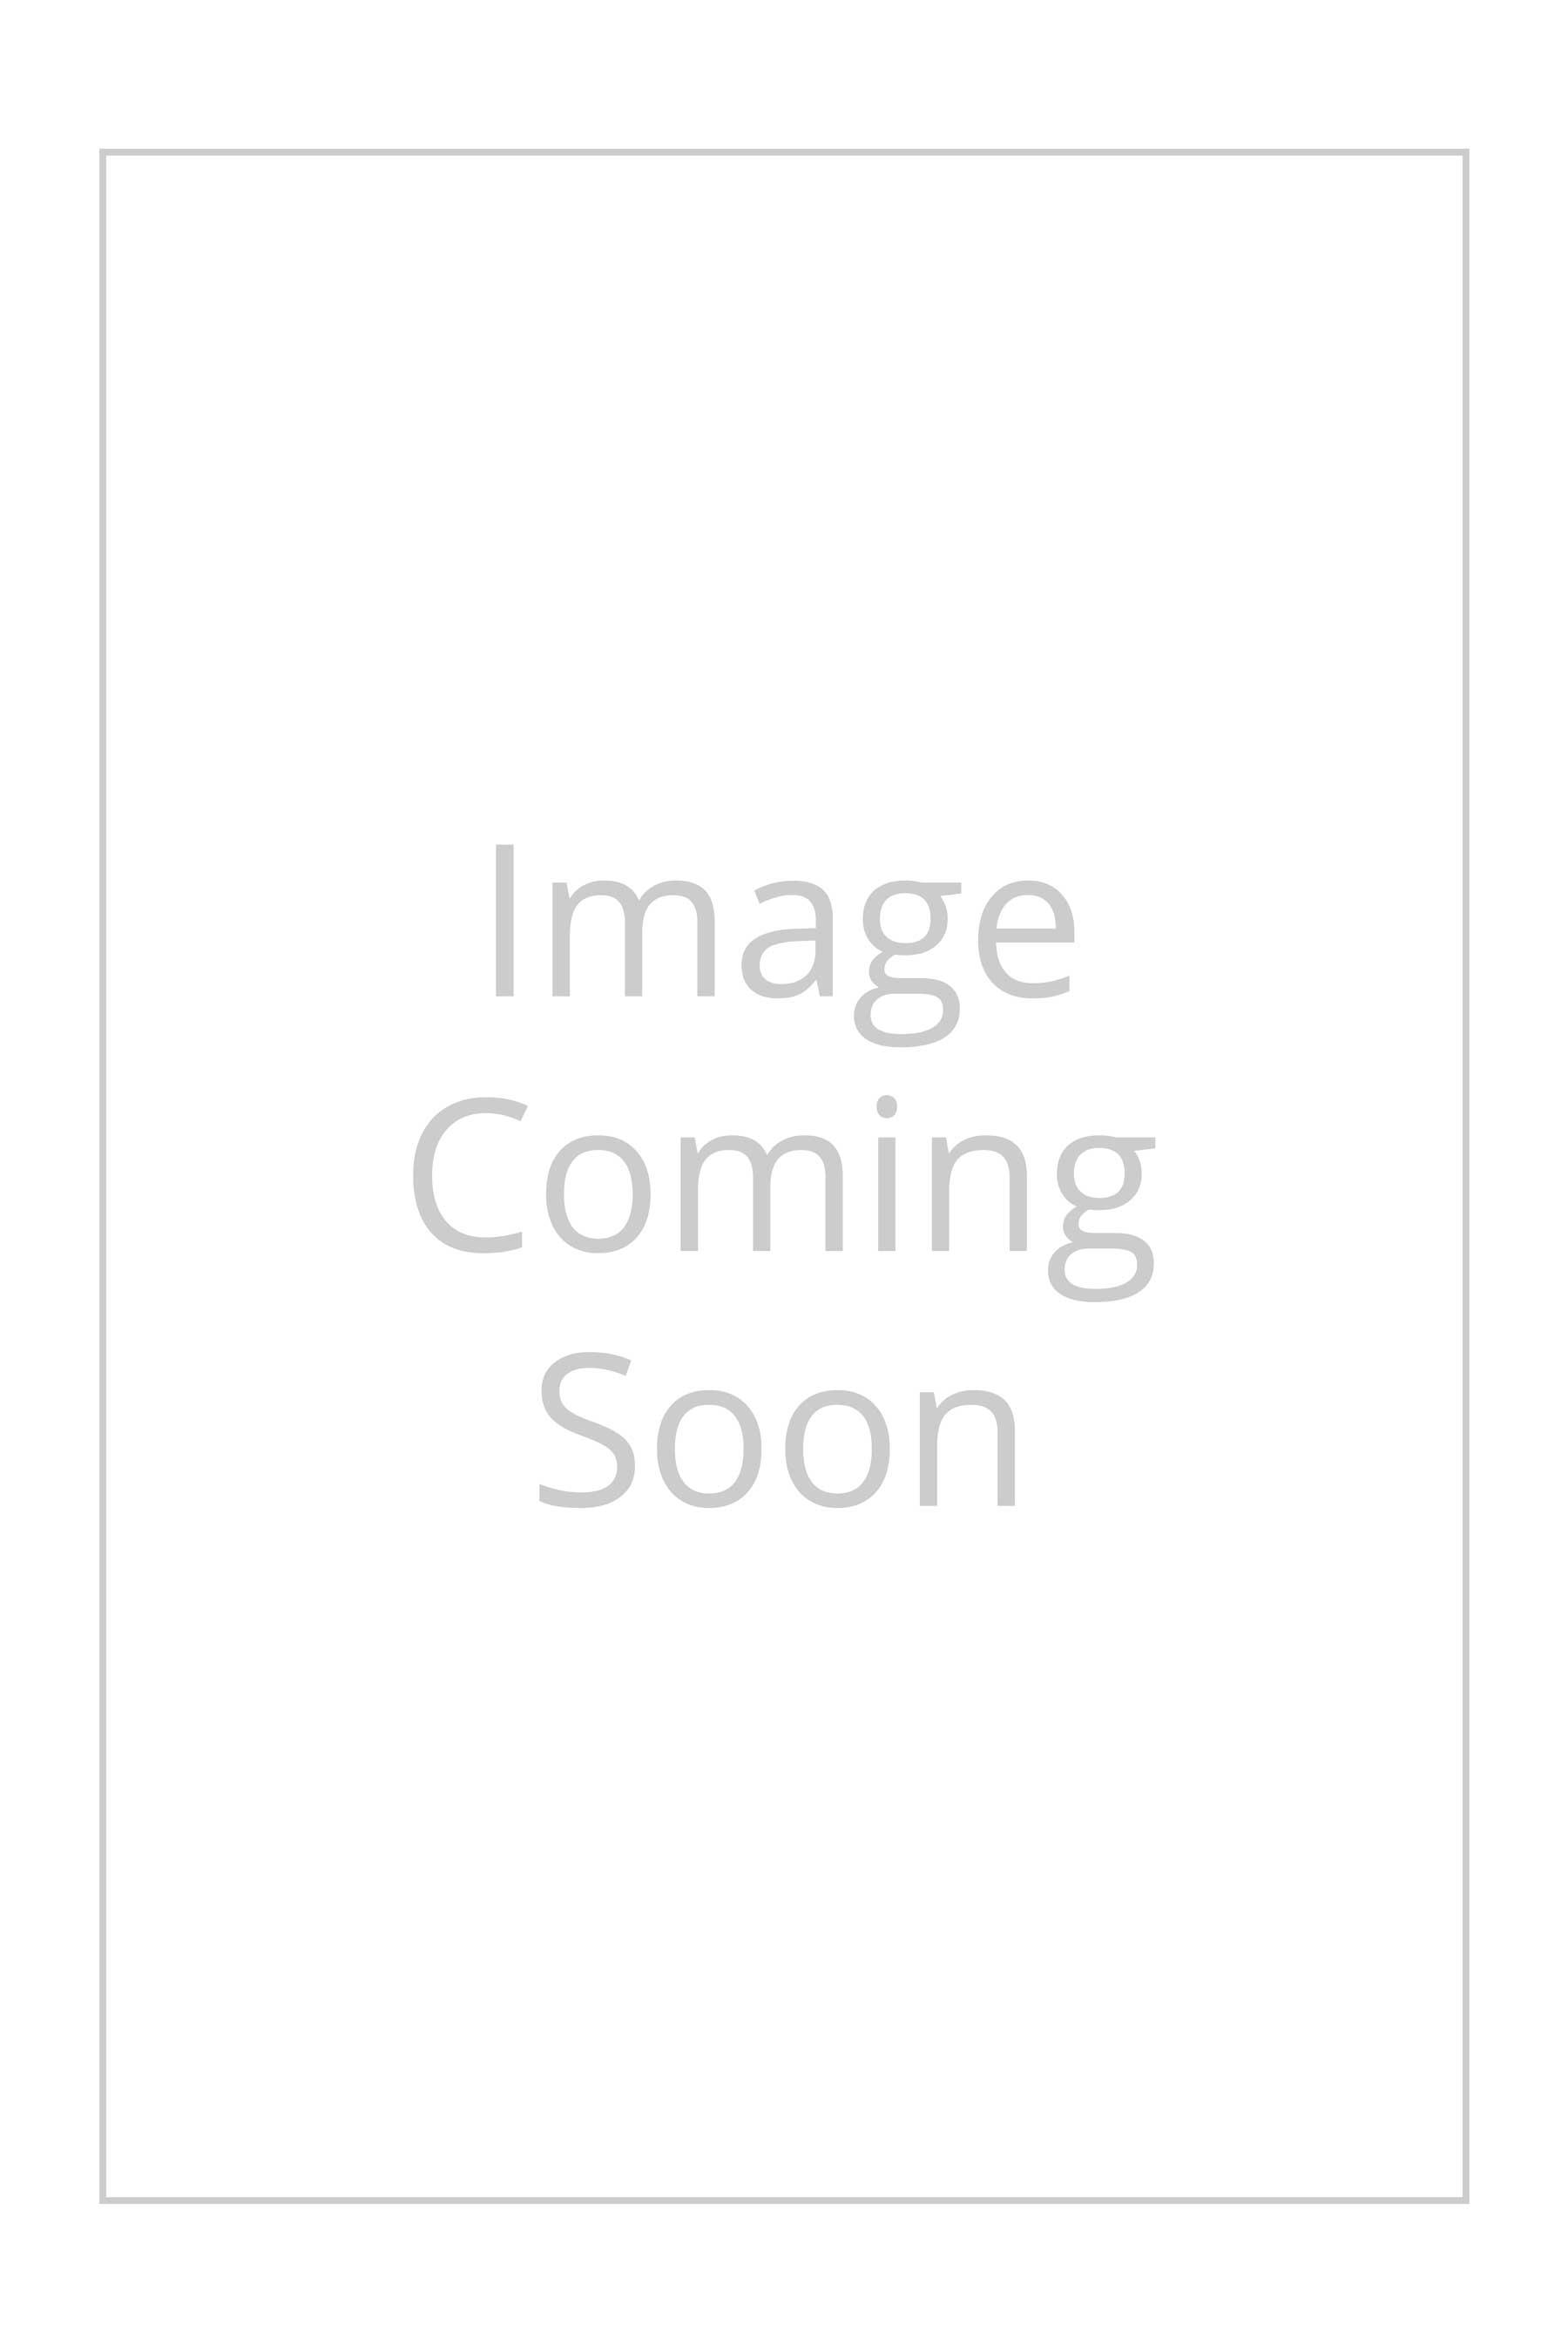 St John Crew Neck Short Sleeve Santana Knit Top in Off-White